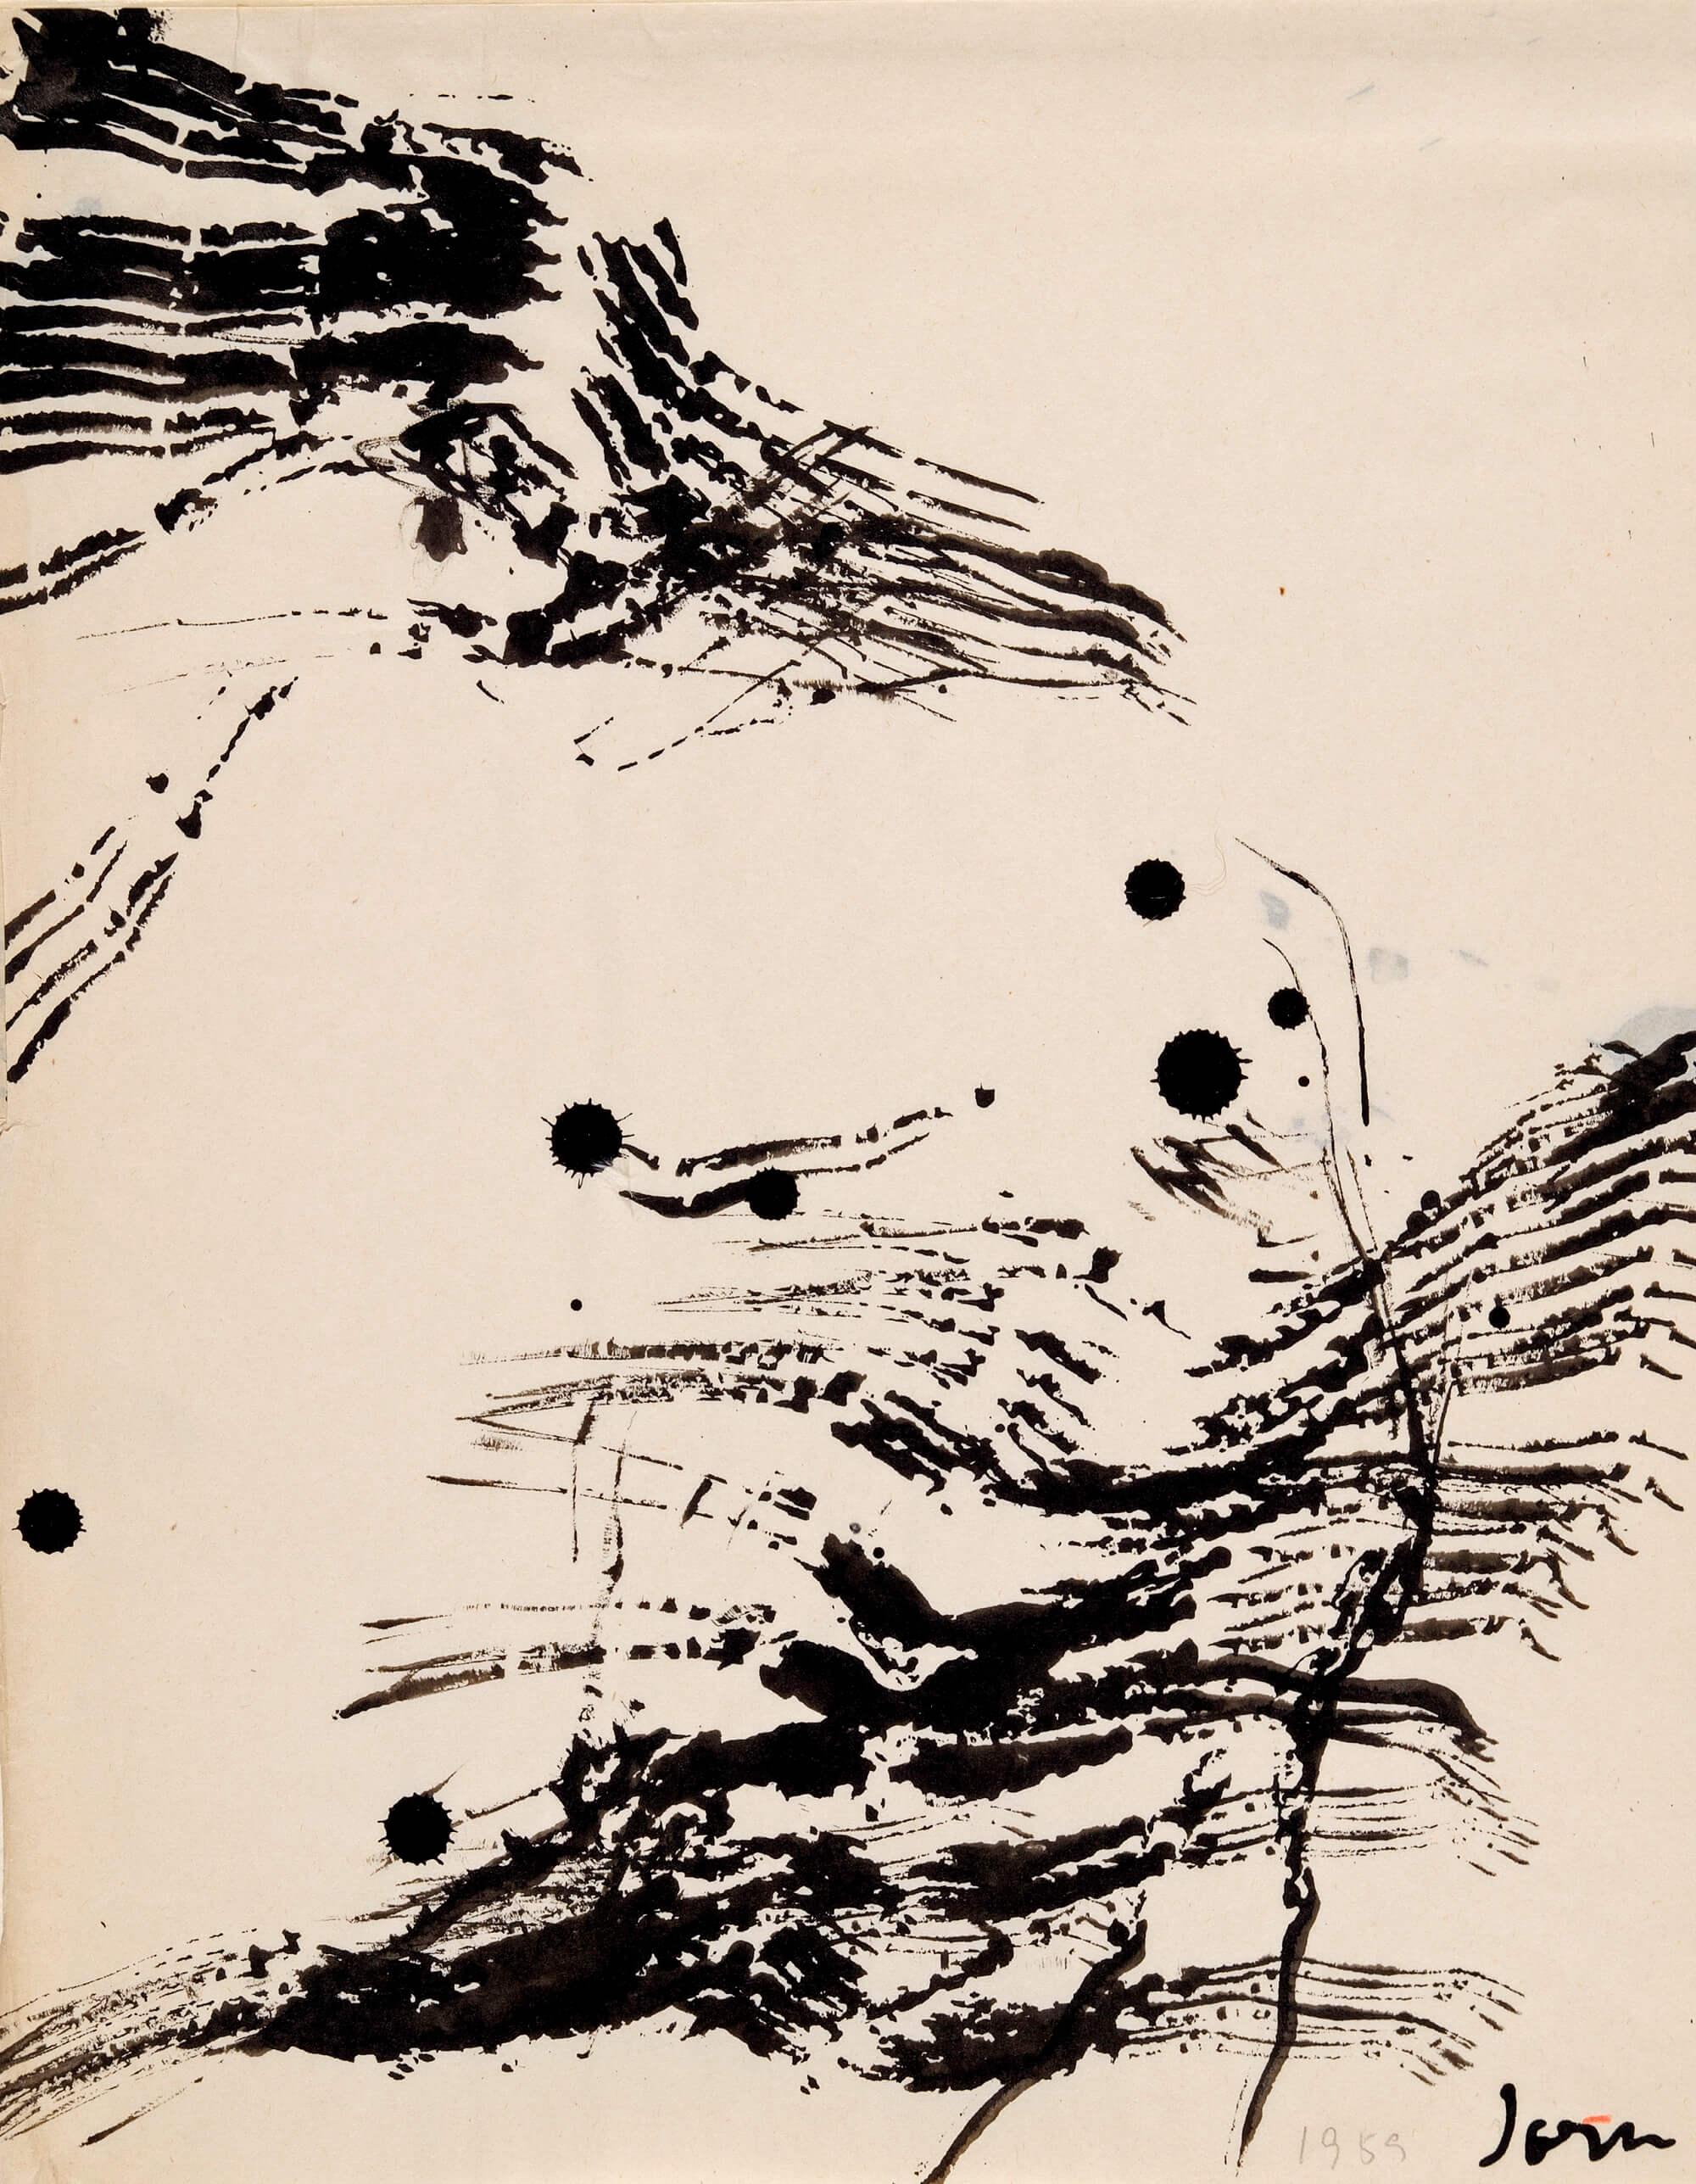 Asger Jorn: UDEN TITEL, 1959 Tusch på papir 27,1 x 21,1 cm